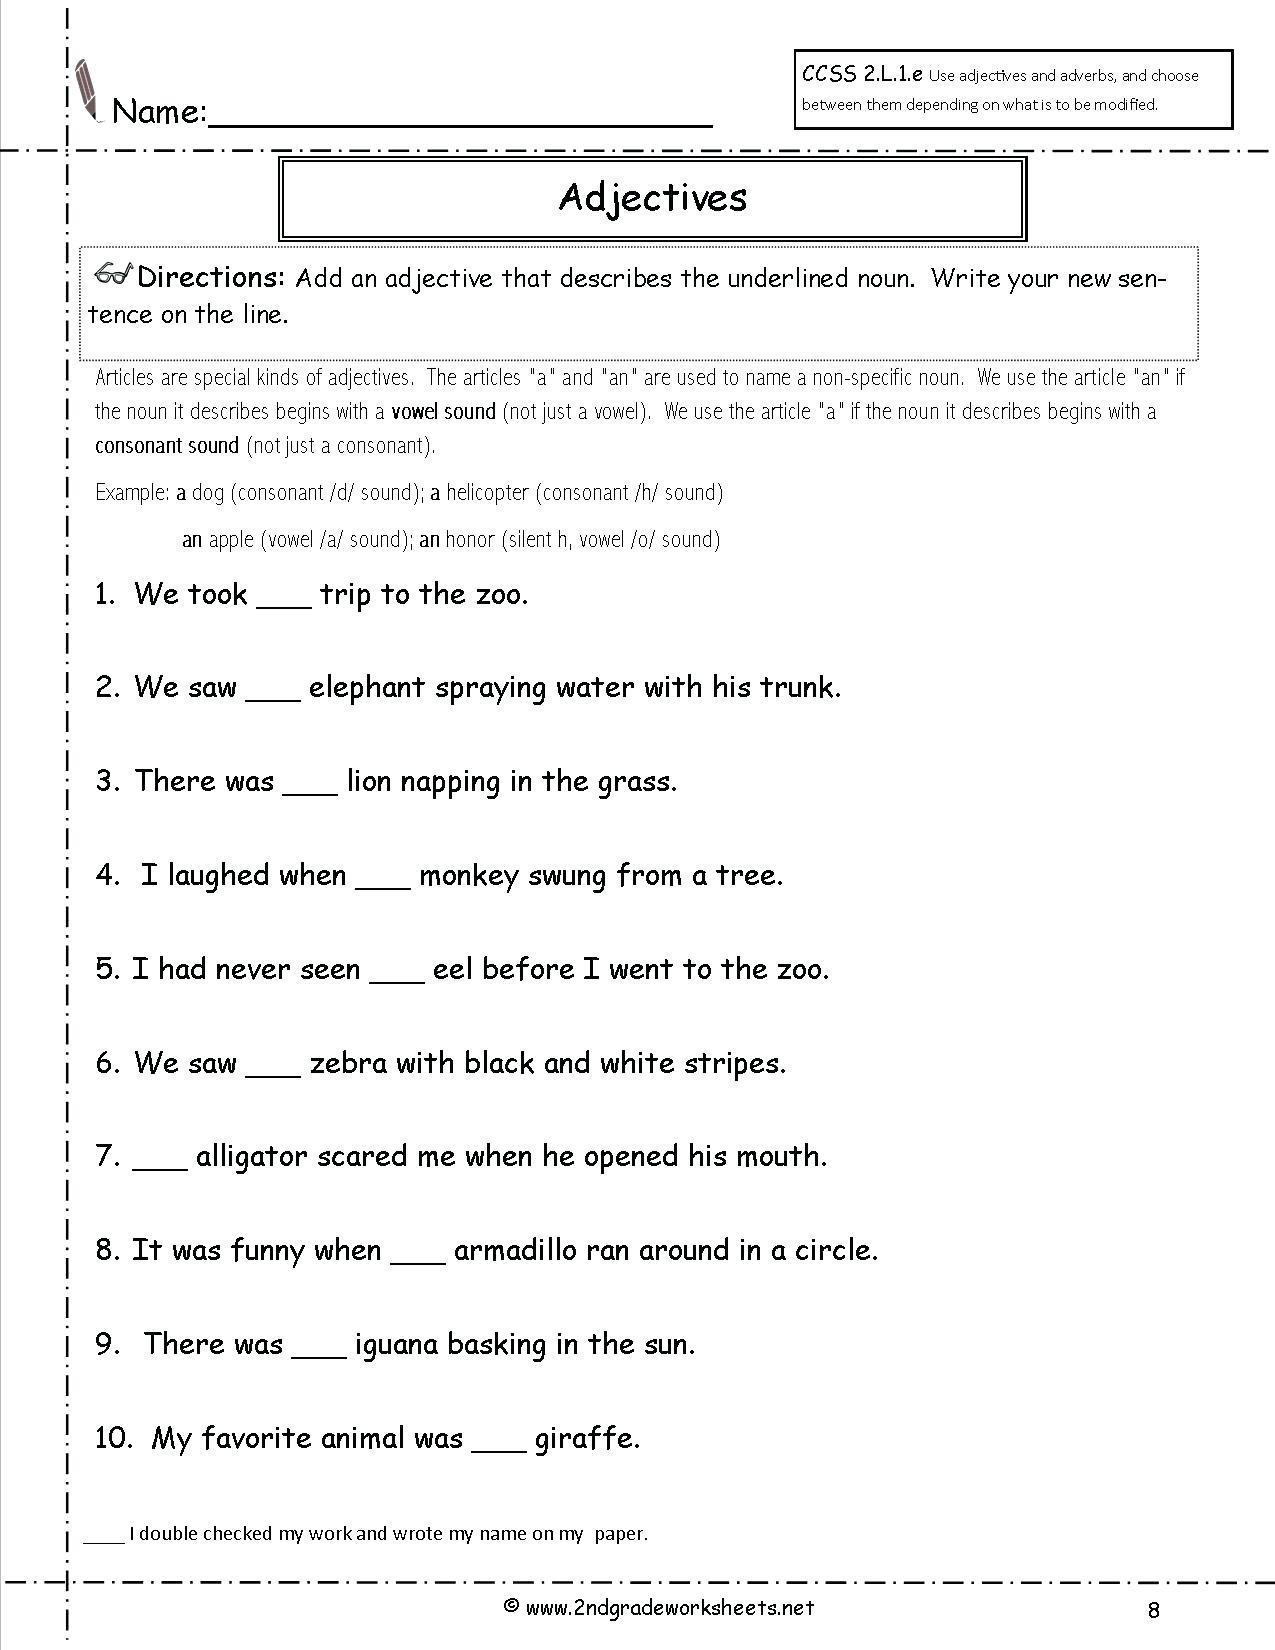 Ocean Floor Worksheets 5th Grade Fifth Grade Science Worksheets